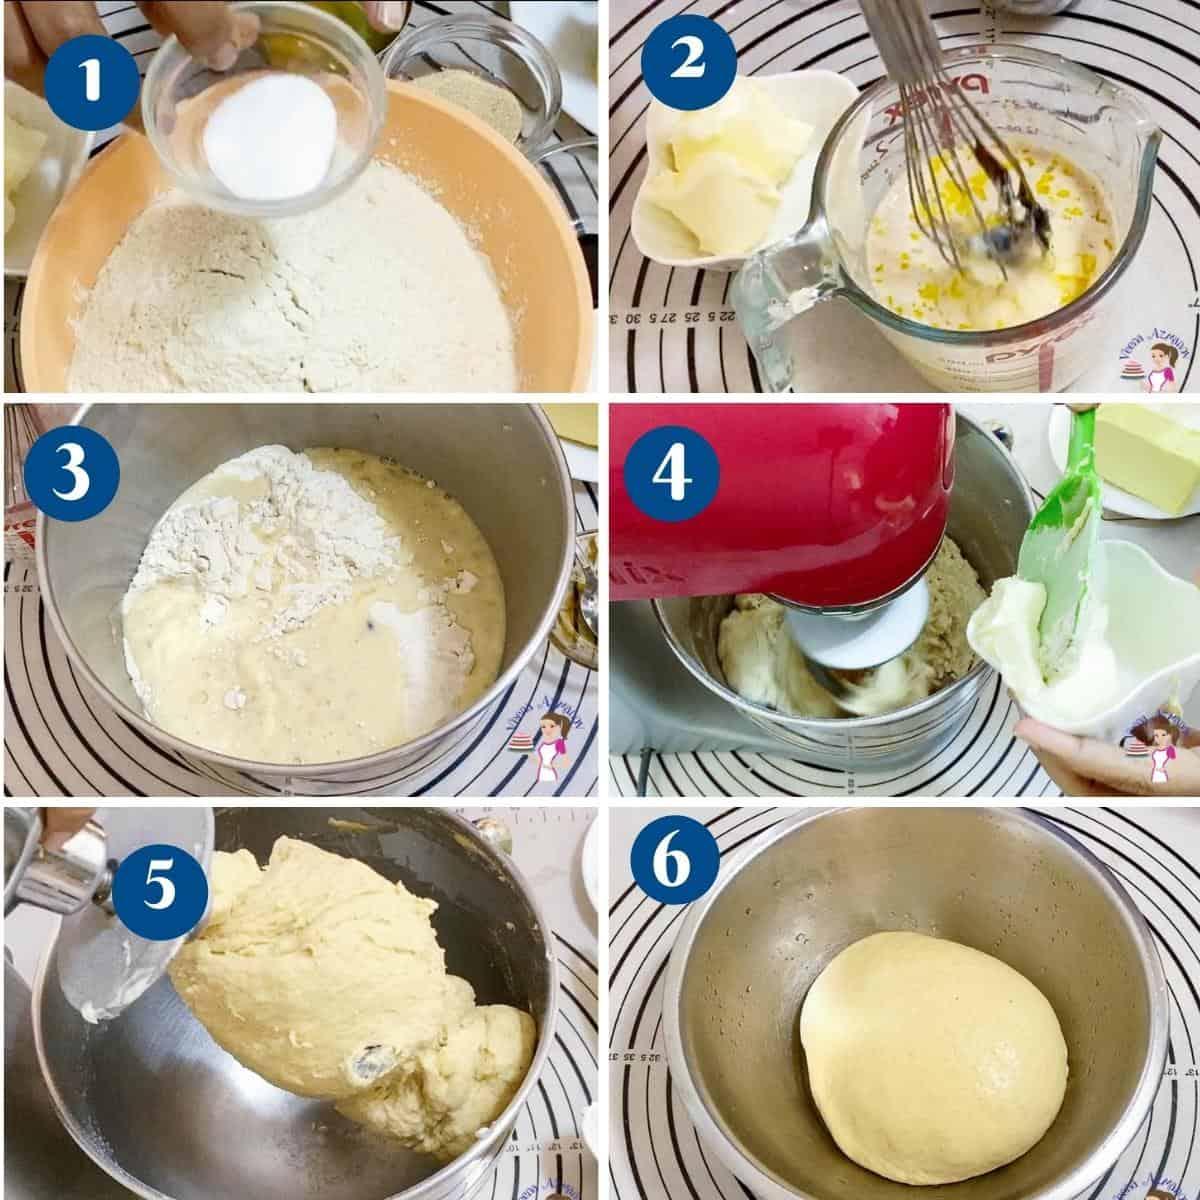 Progress Pictures preparing the Danish Dough for pastry.